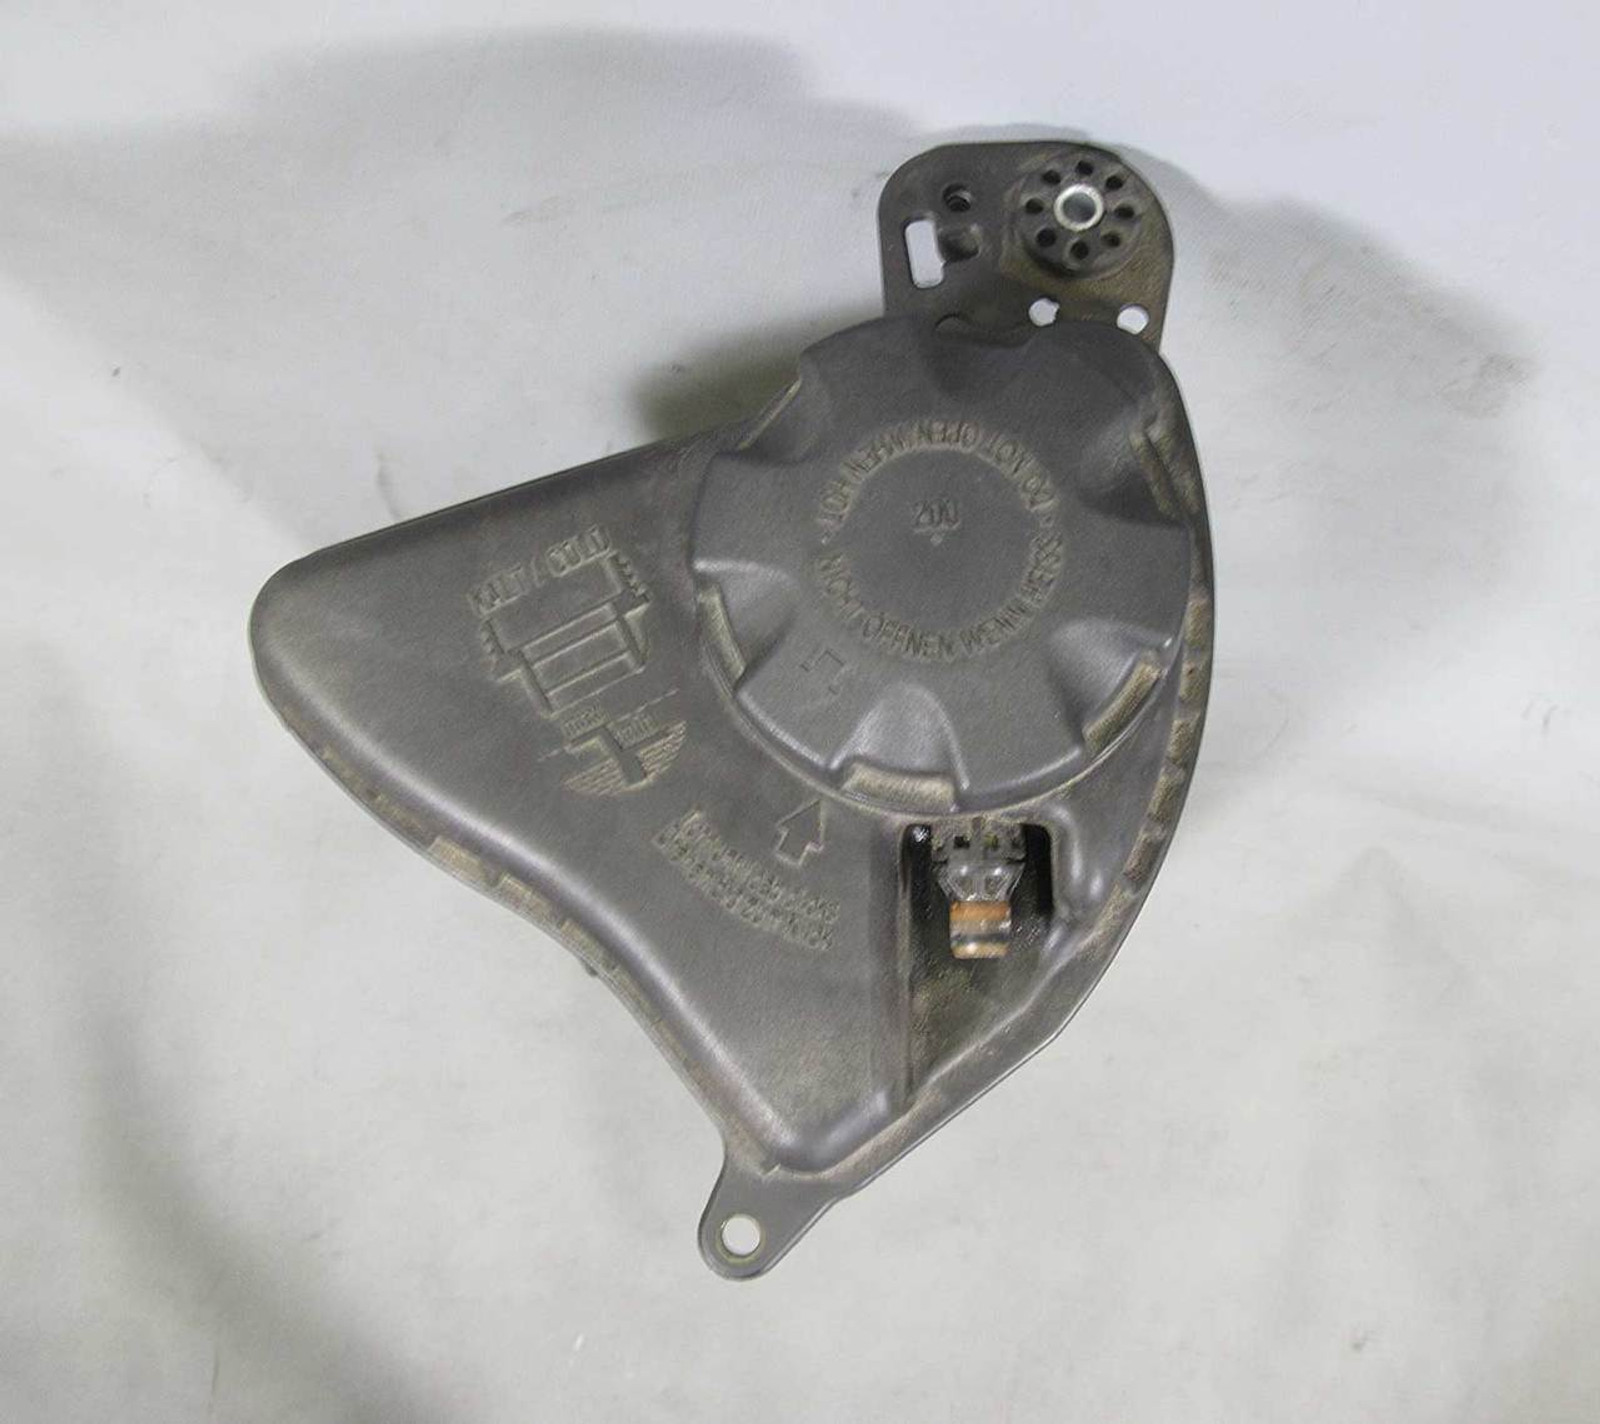 BMW F10 535i F12 640i N55 Turbo Engine Coolant Expansion